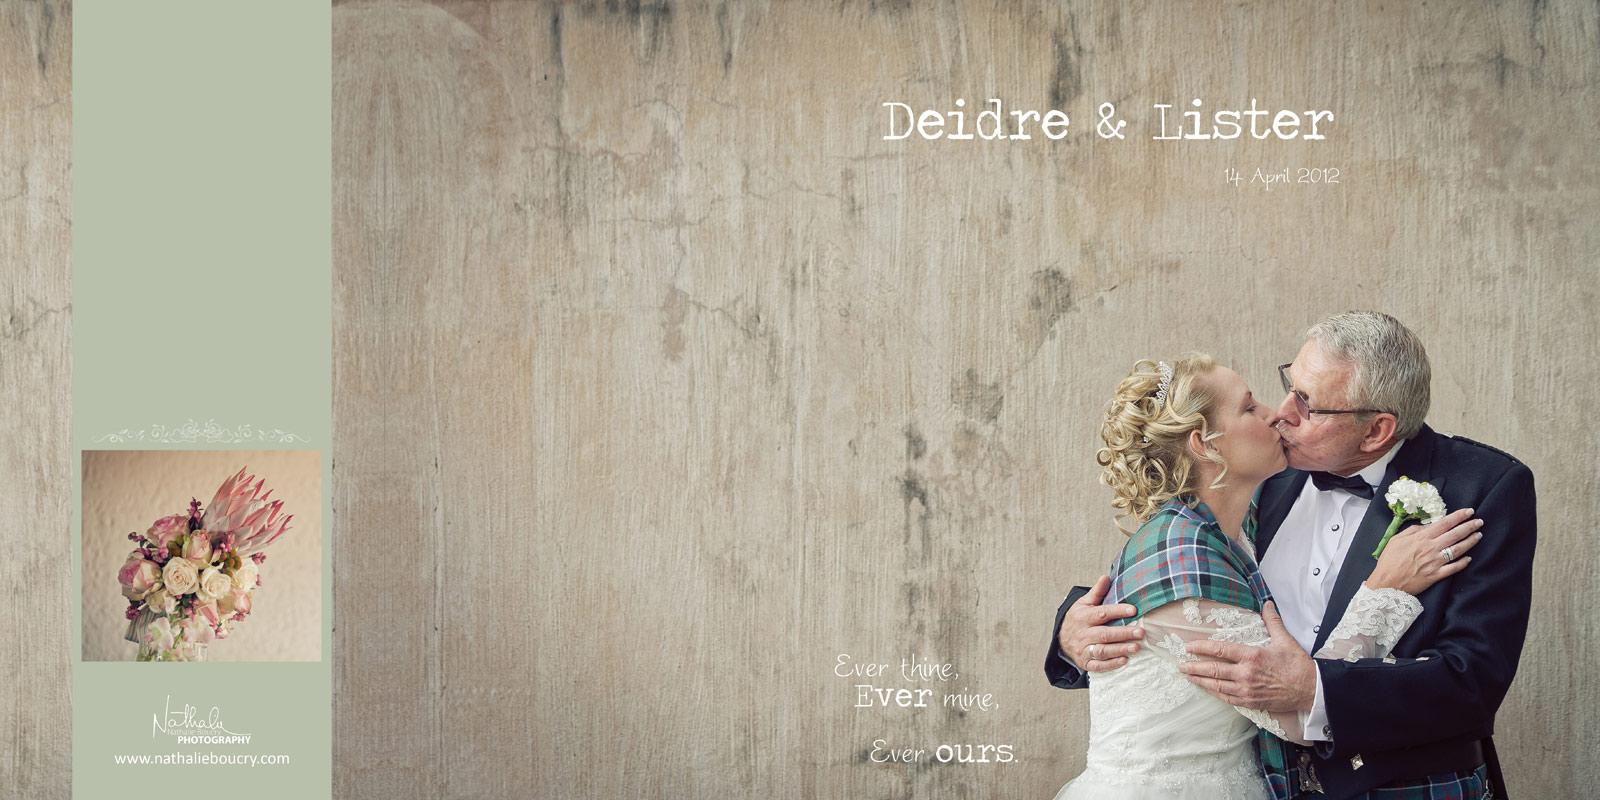 Nathalie Boucry Photography | Deidre and Lister Wedding Album